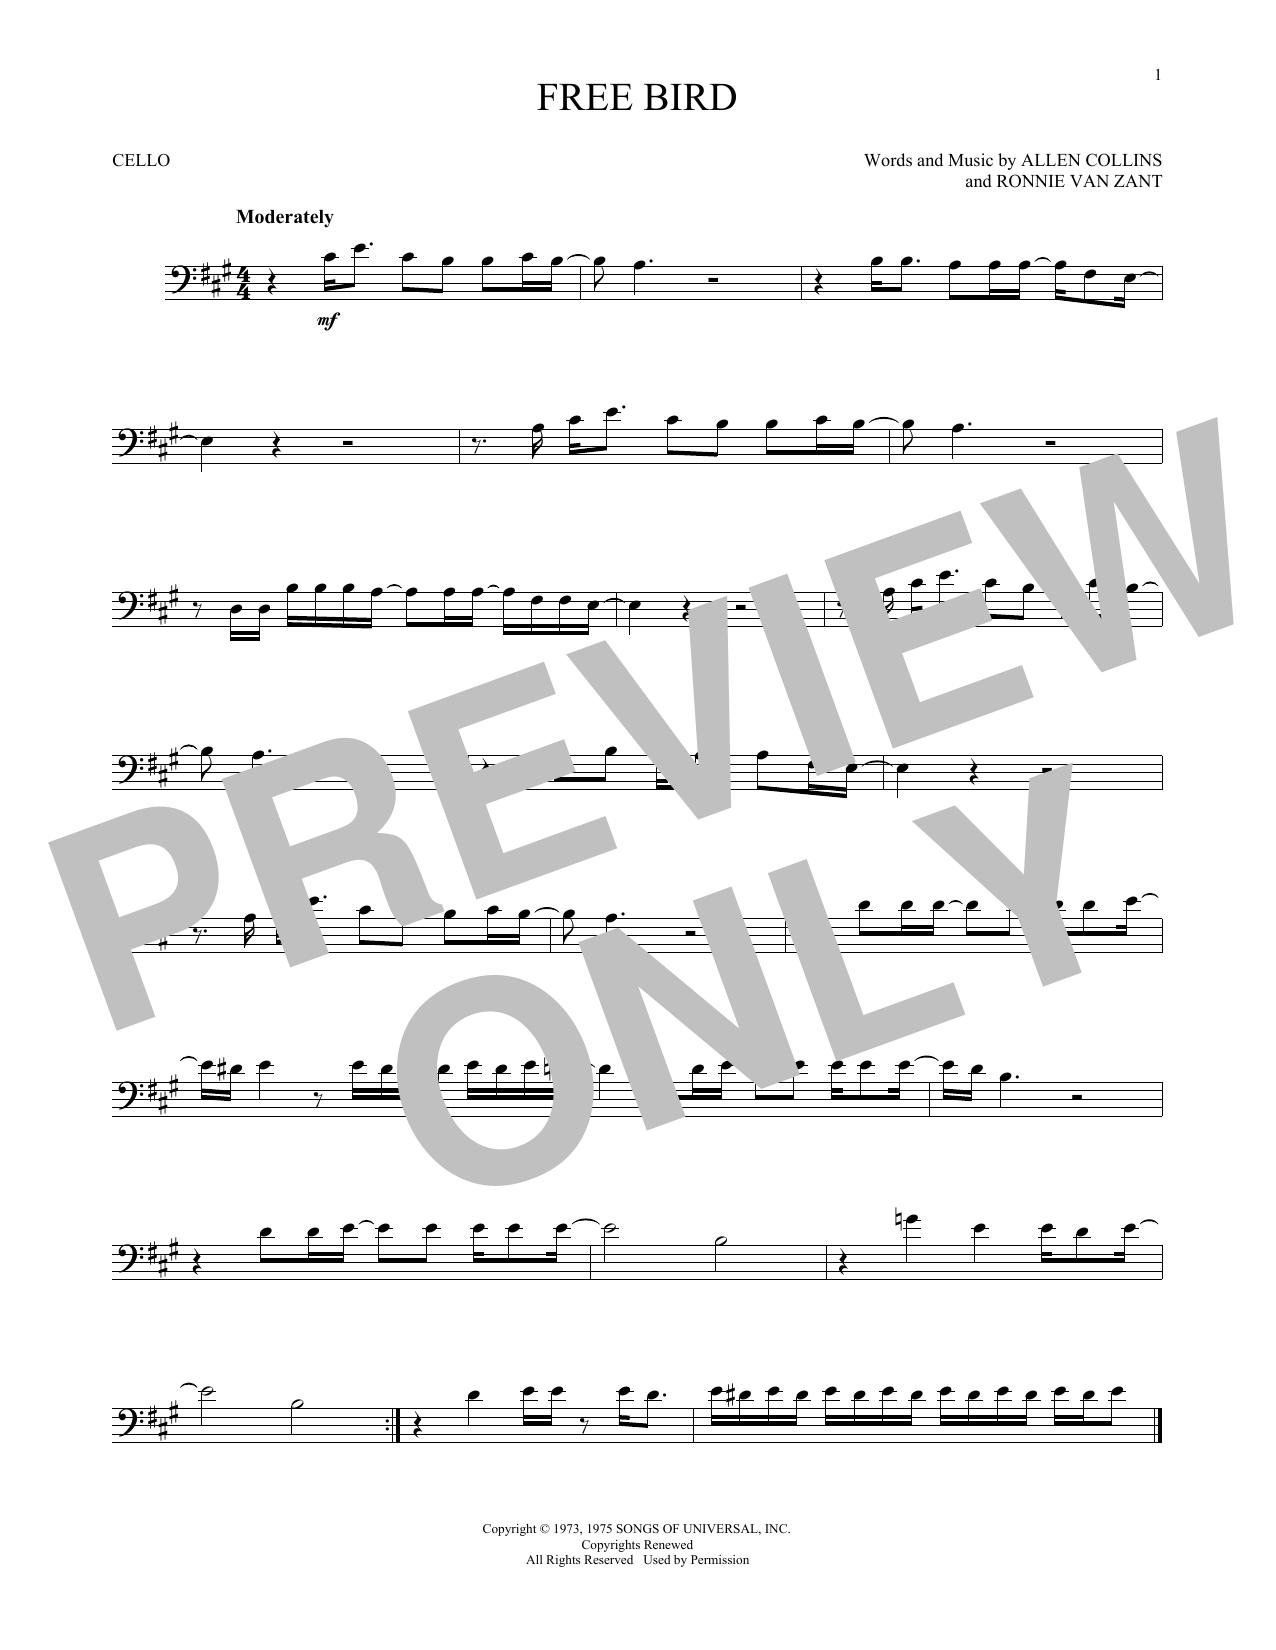 Free Bird Print Sheet Music Now